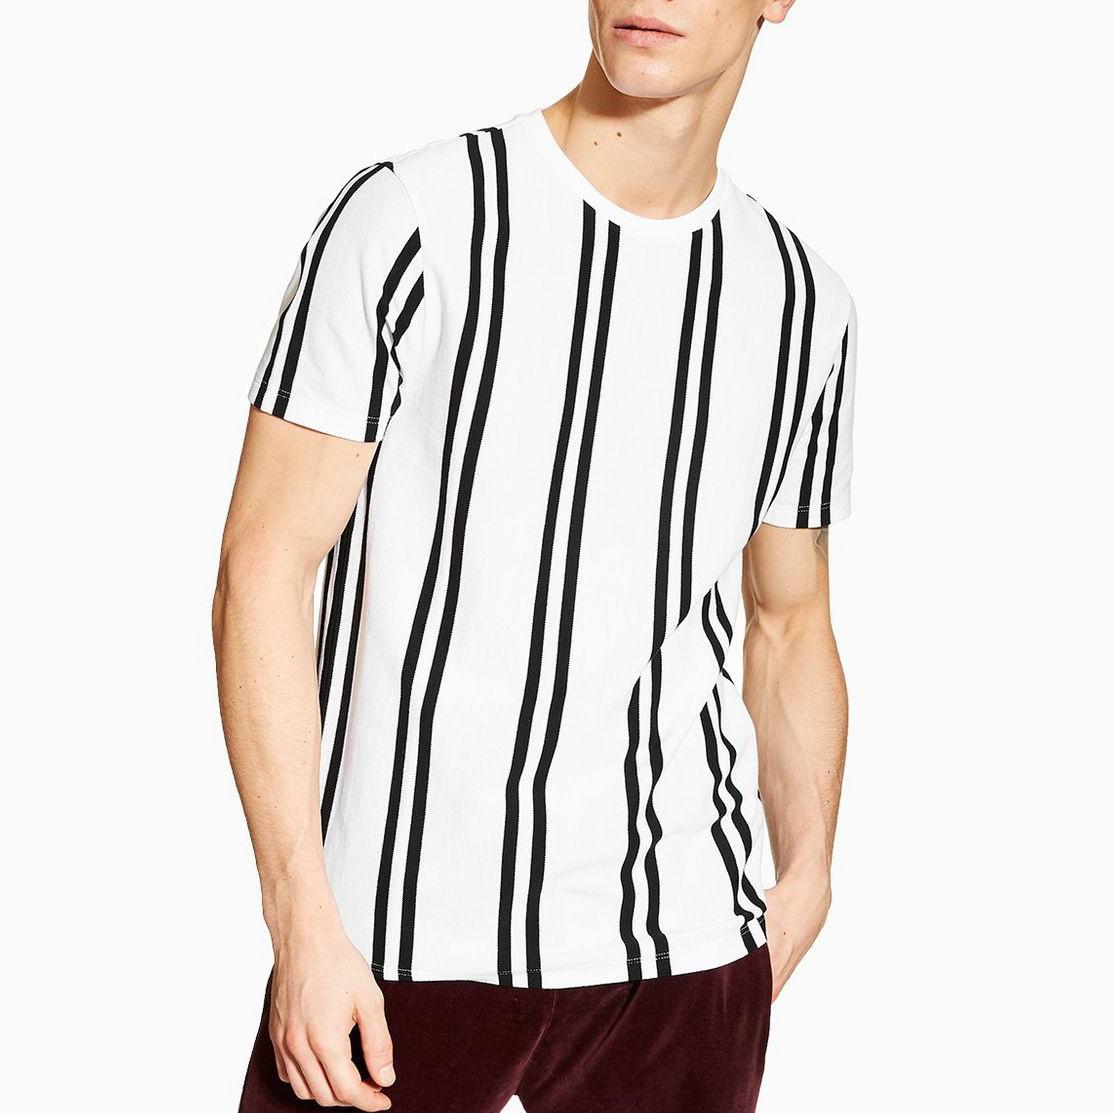 Pria Jalan Wear Kustom Dicetak Hitam Putih Vertikal Bergaris T-Shirt